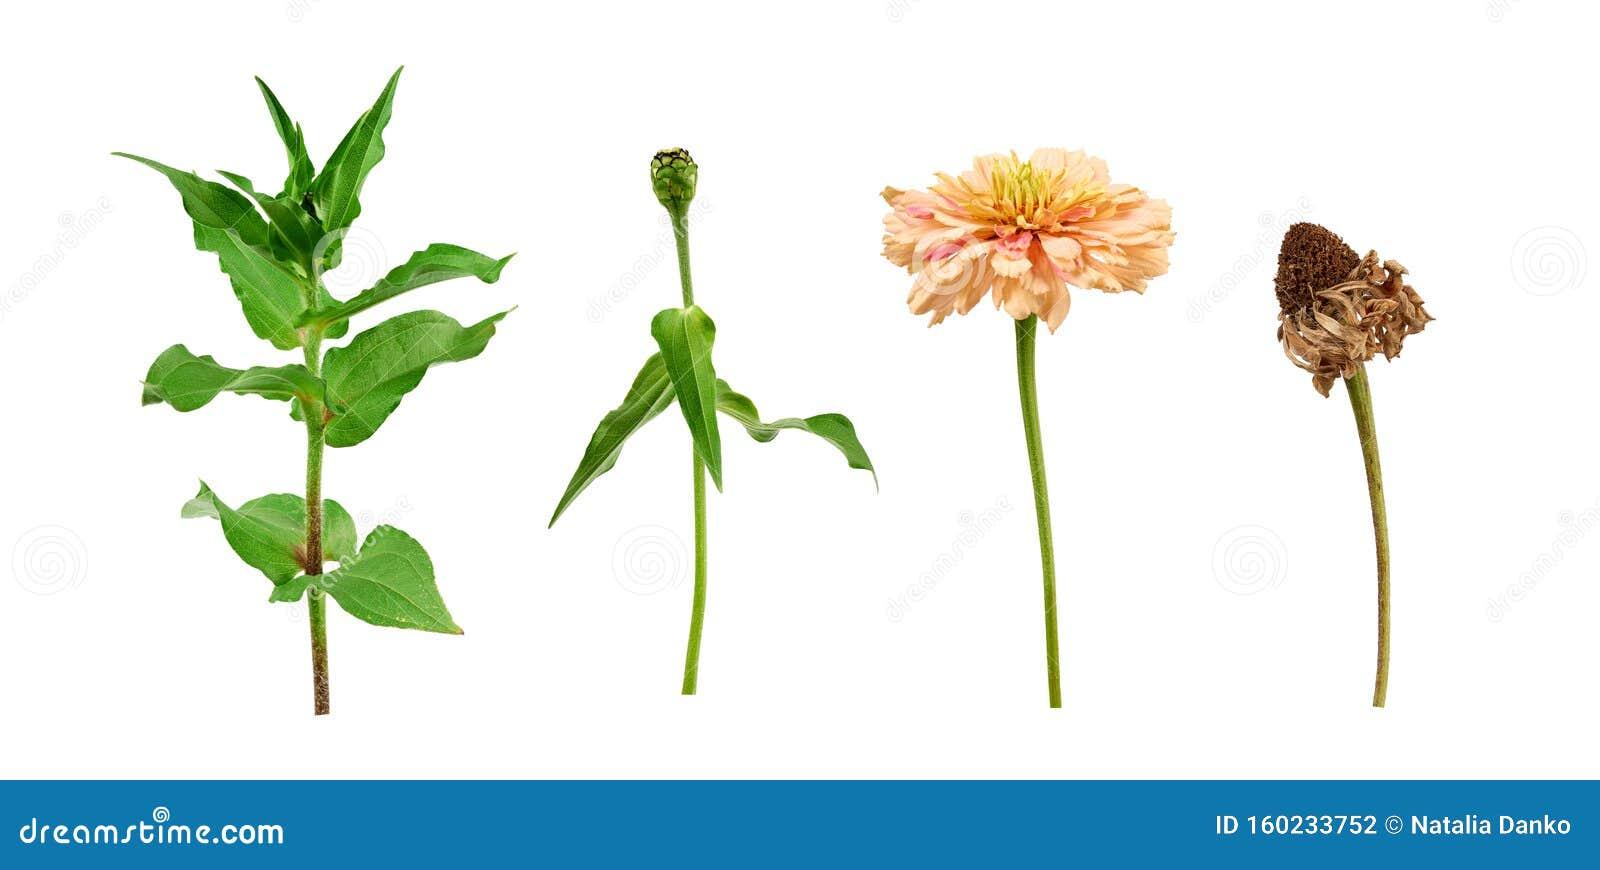 Tige De Fleur Zinnia Avec Feuilles Vertes, Bourgeon Fleuri ...